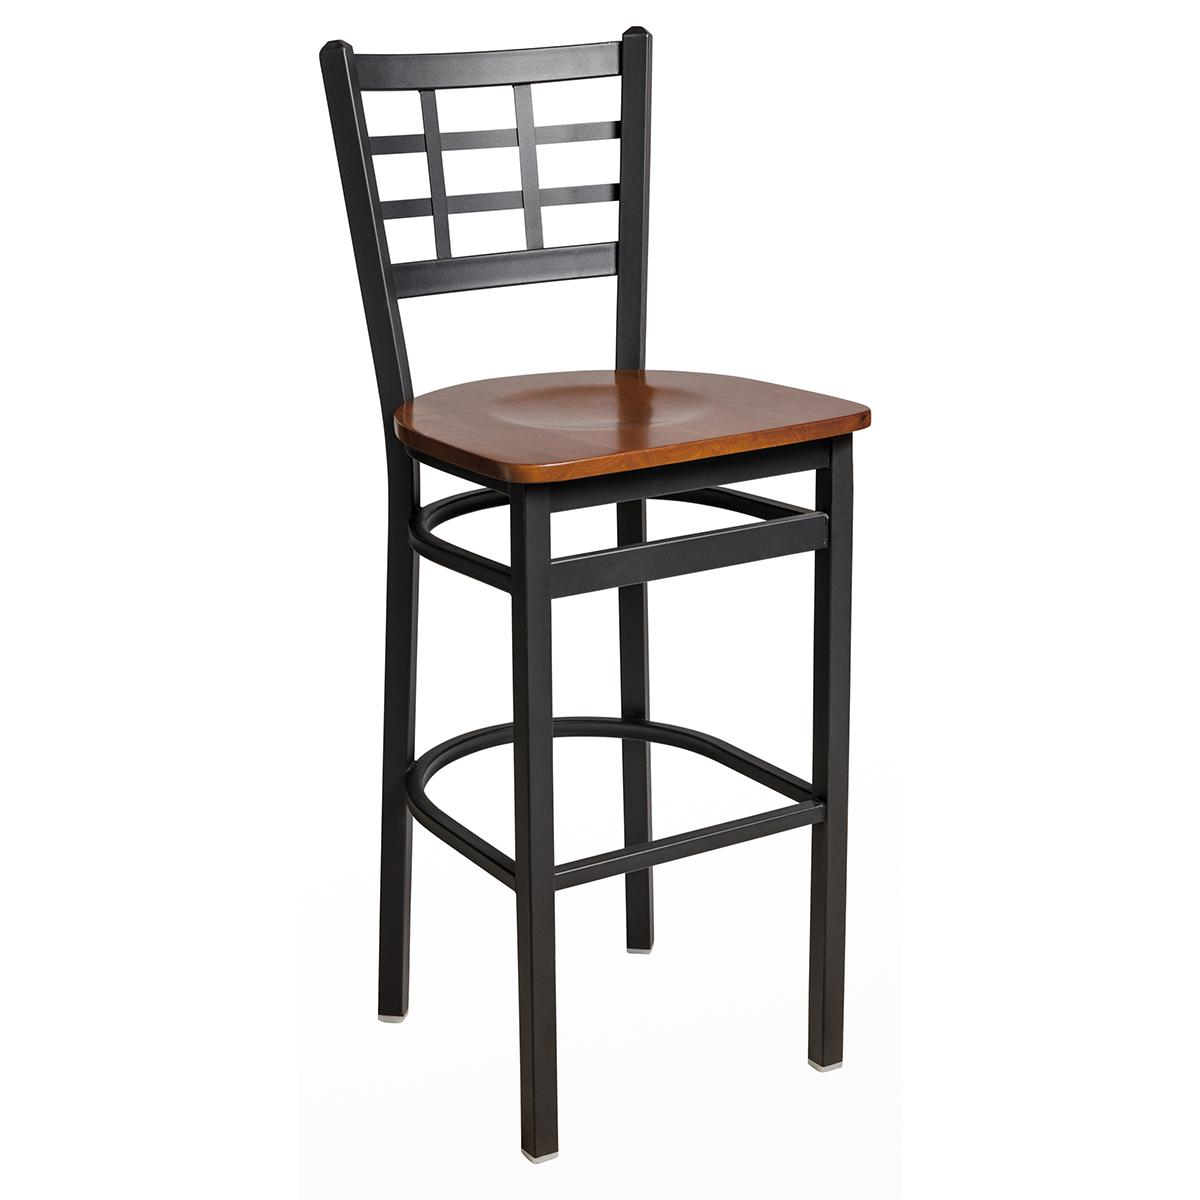 black steel barstool with window pane back and wood seat